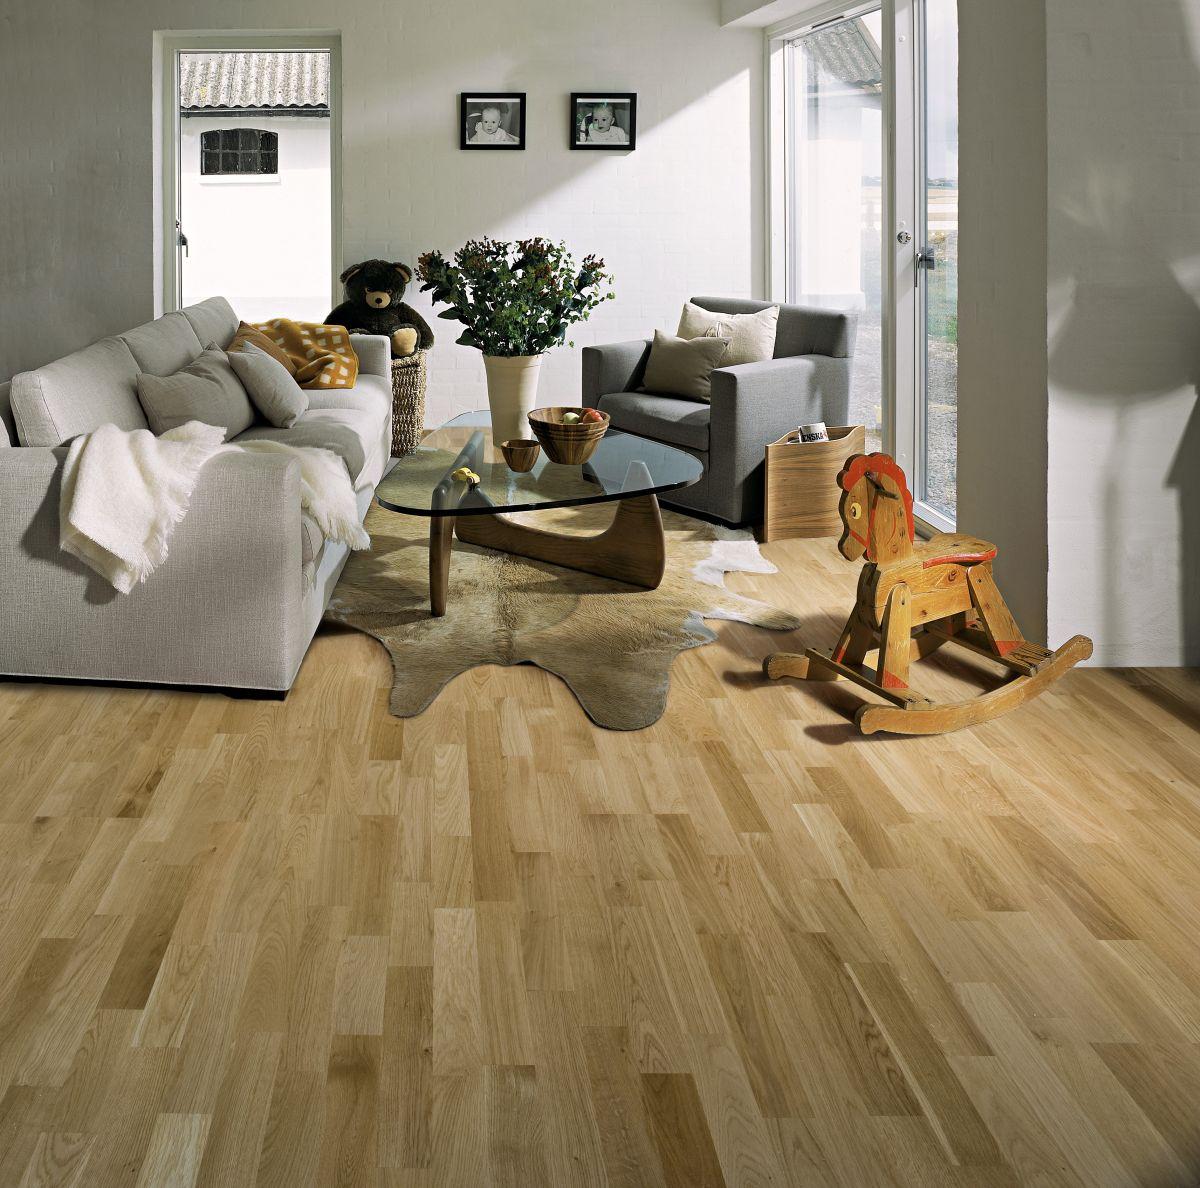 drevena-podlaha-kahrs_kolekce-european-naturals_dekor-oak-nice_kpp.jpg